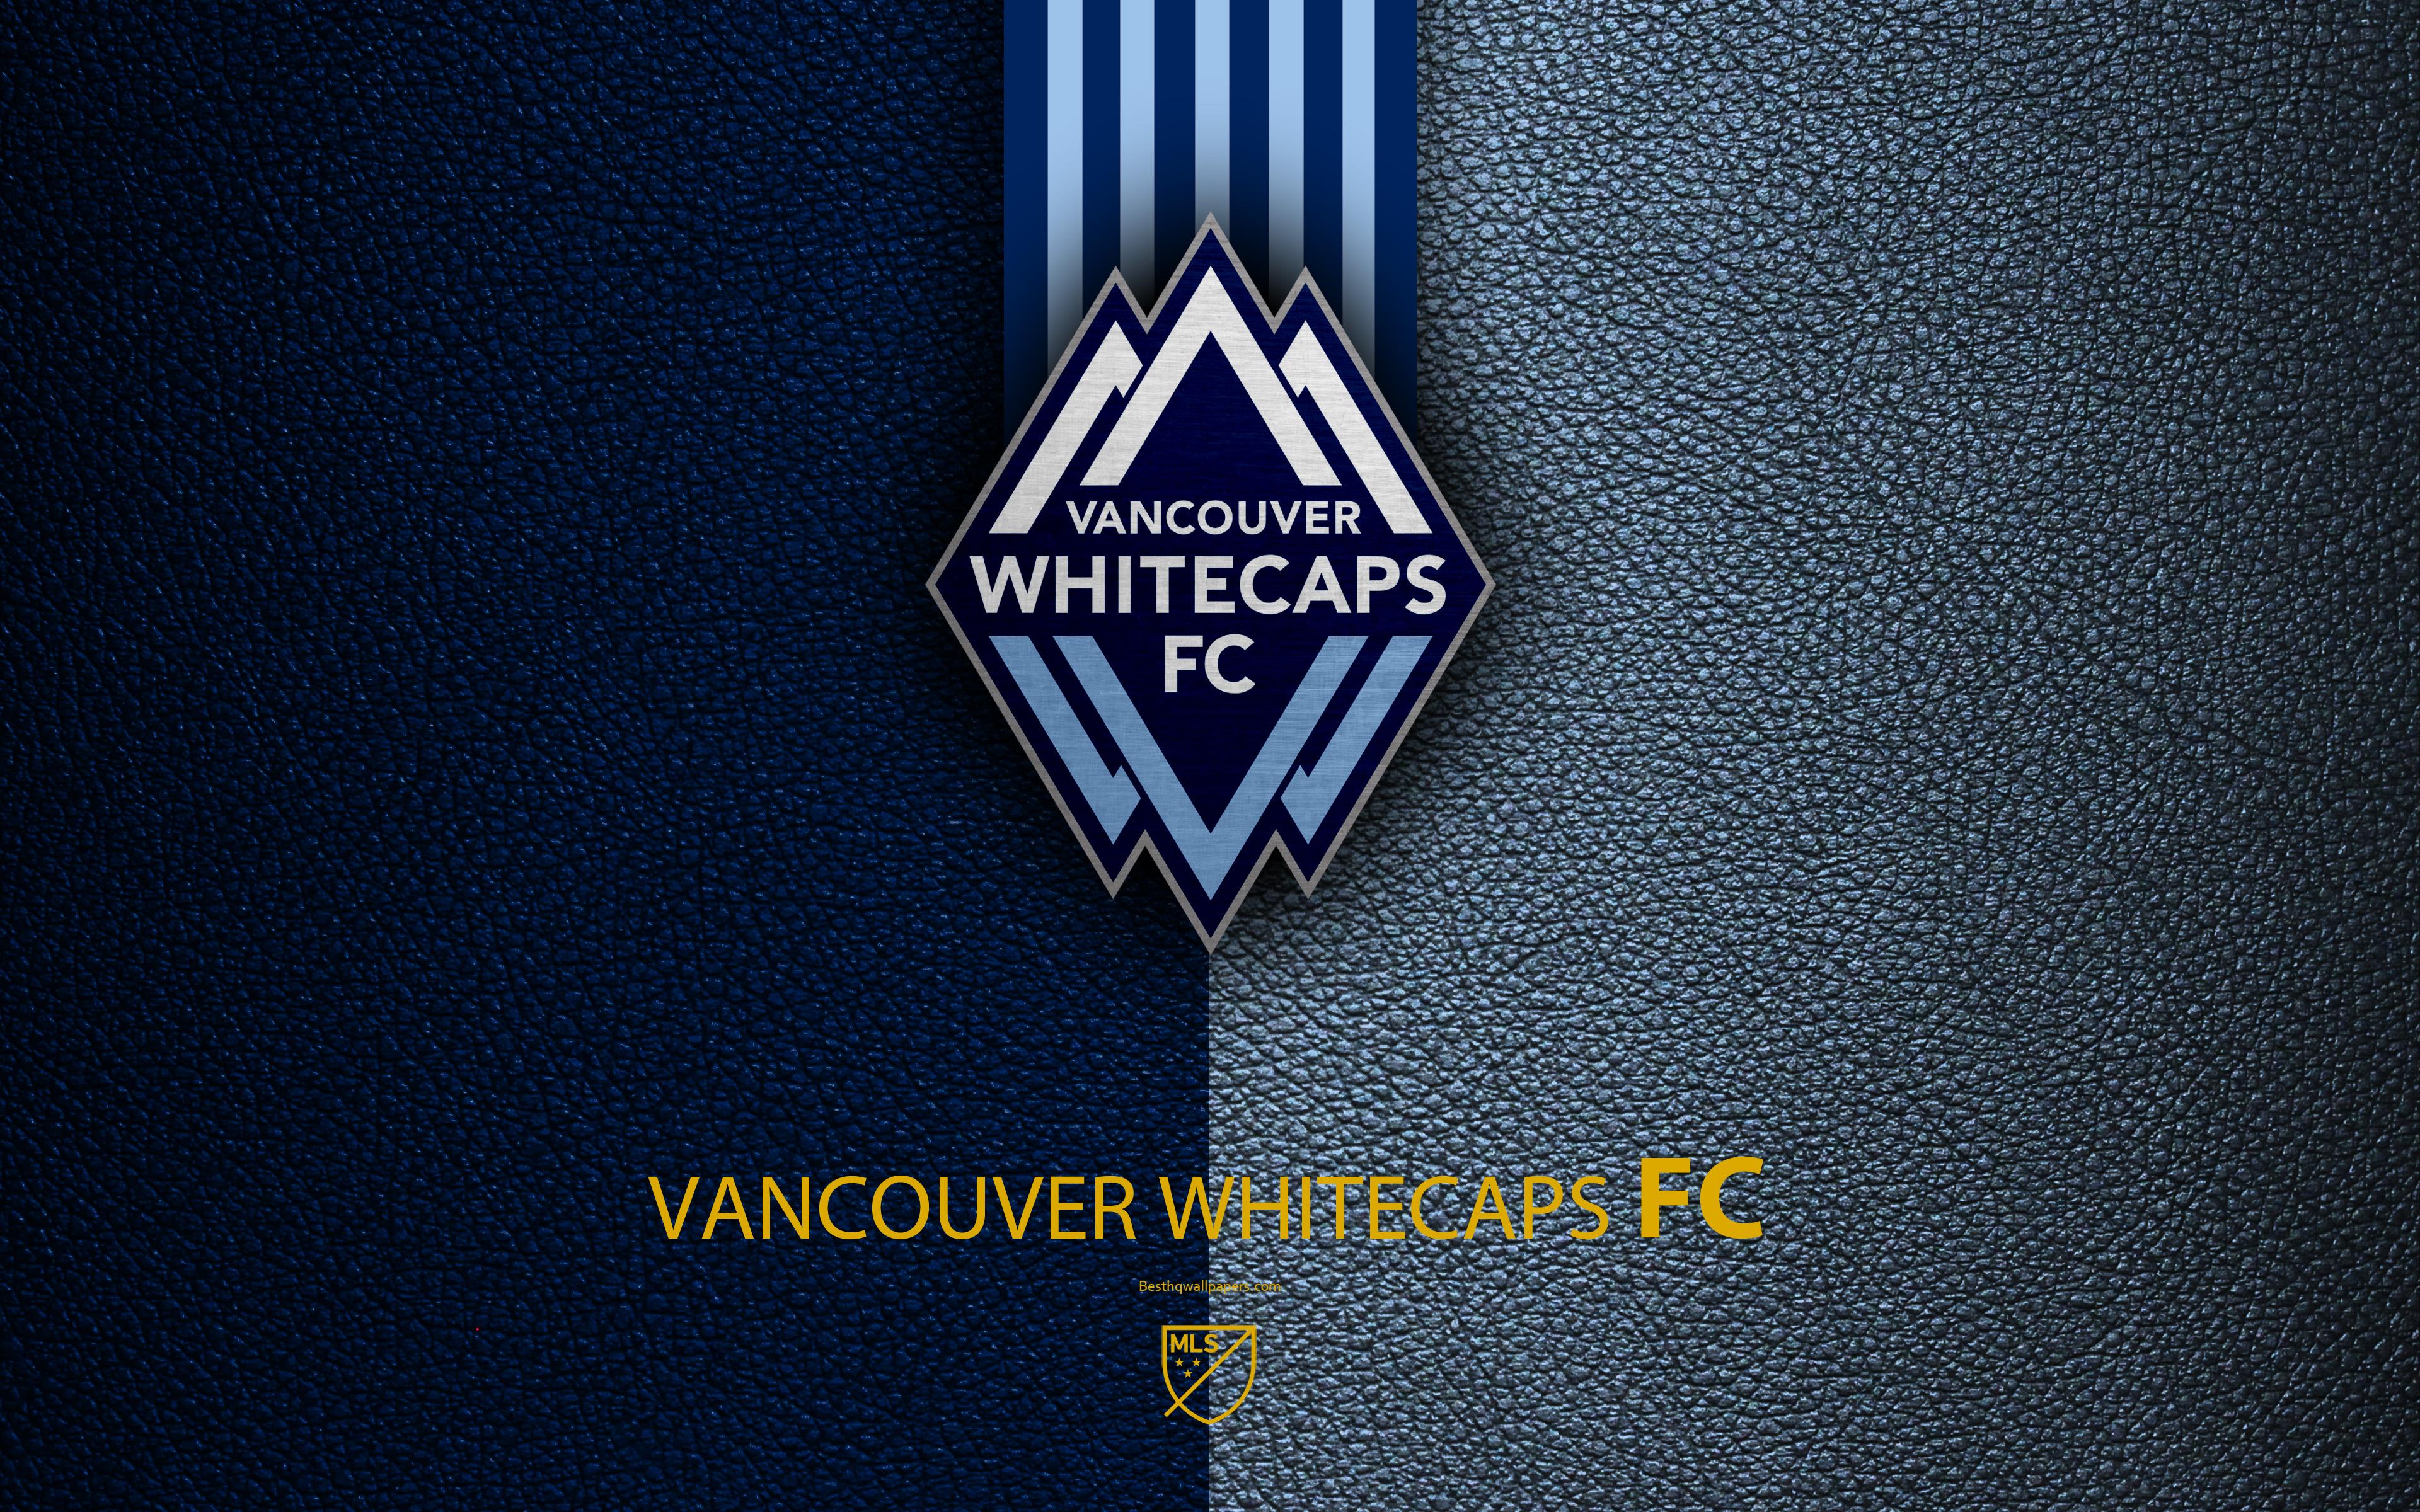 Logo Emblem Soccer MLS Vancouver Whitecaps FC wallpaper and 3840x2400